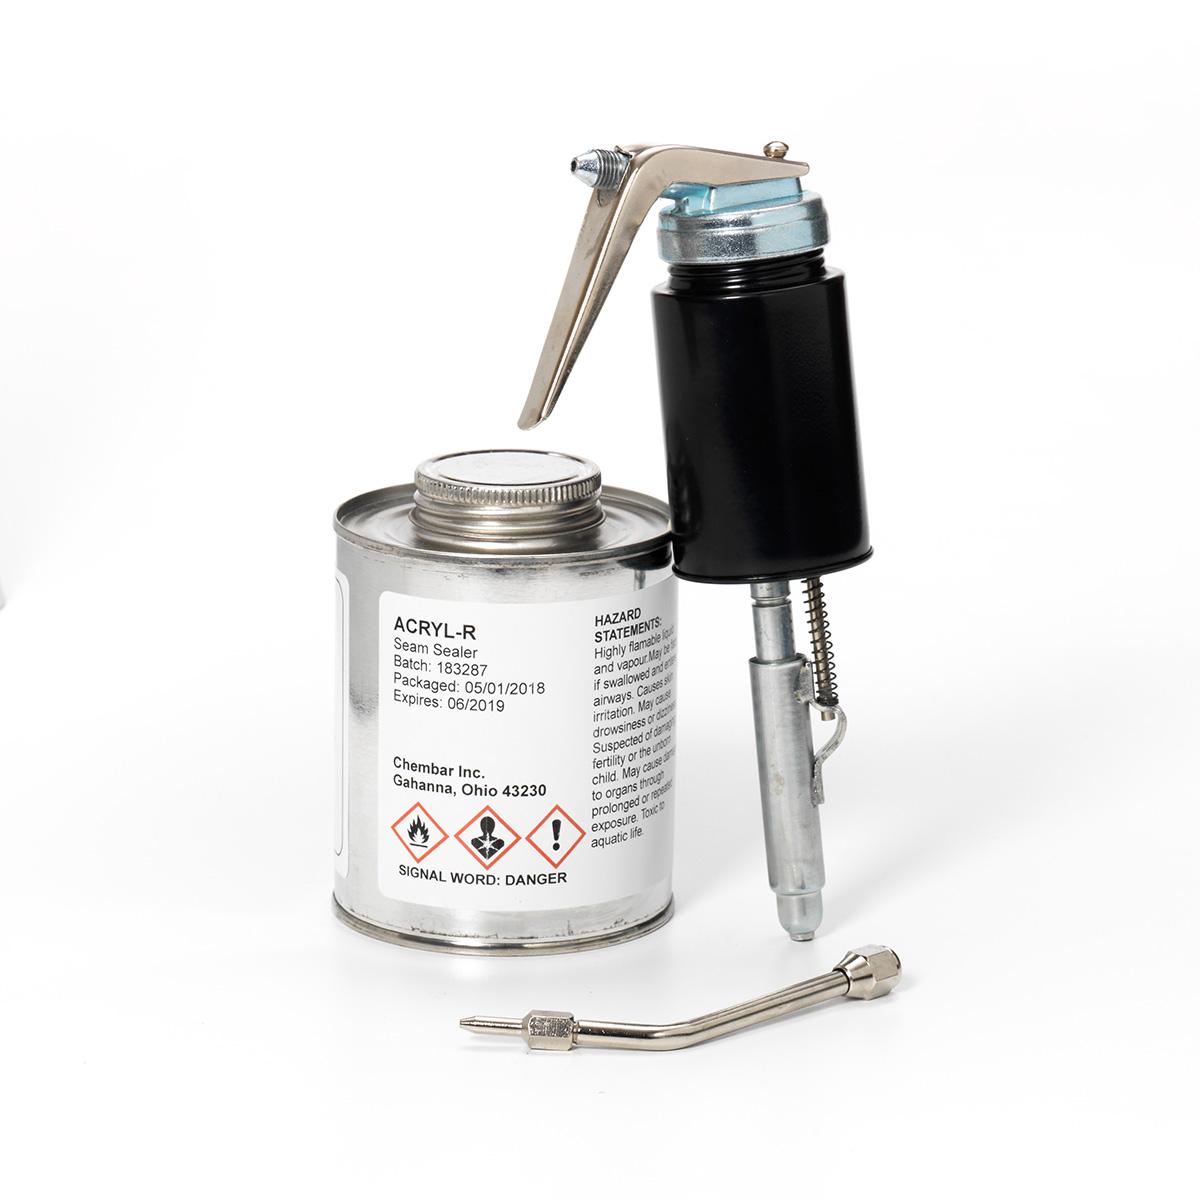 AIRMKT eCom PN 28430W-100 Acryl-R 16 oz Can with Applicator 41420 WEB